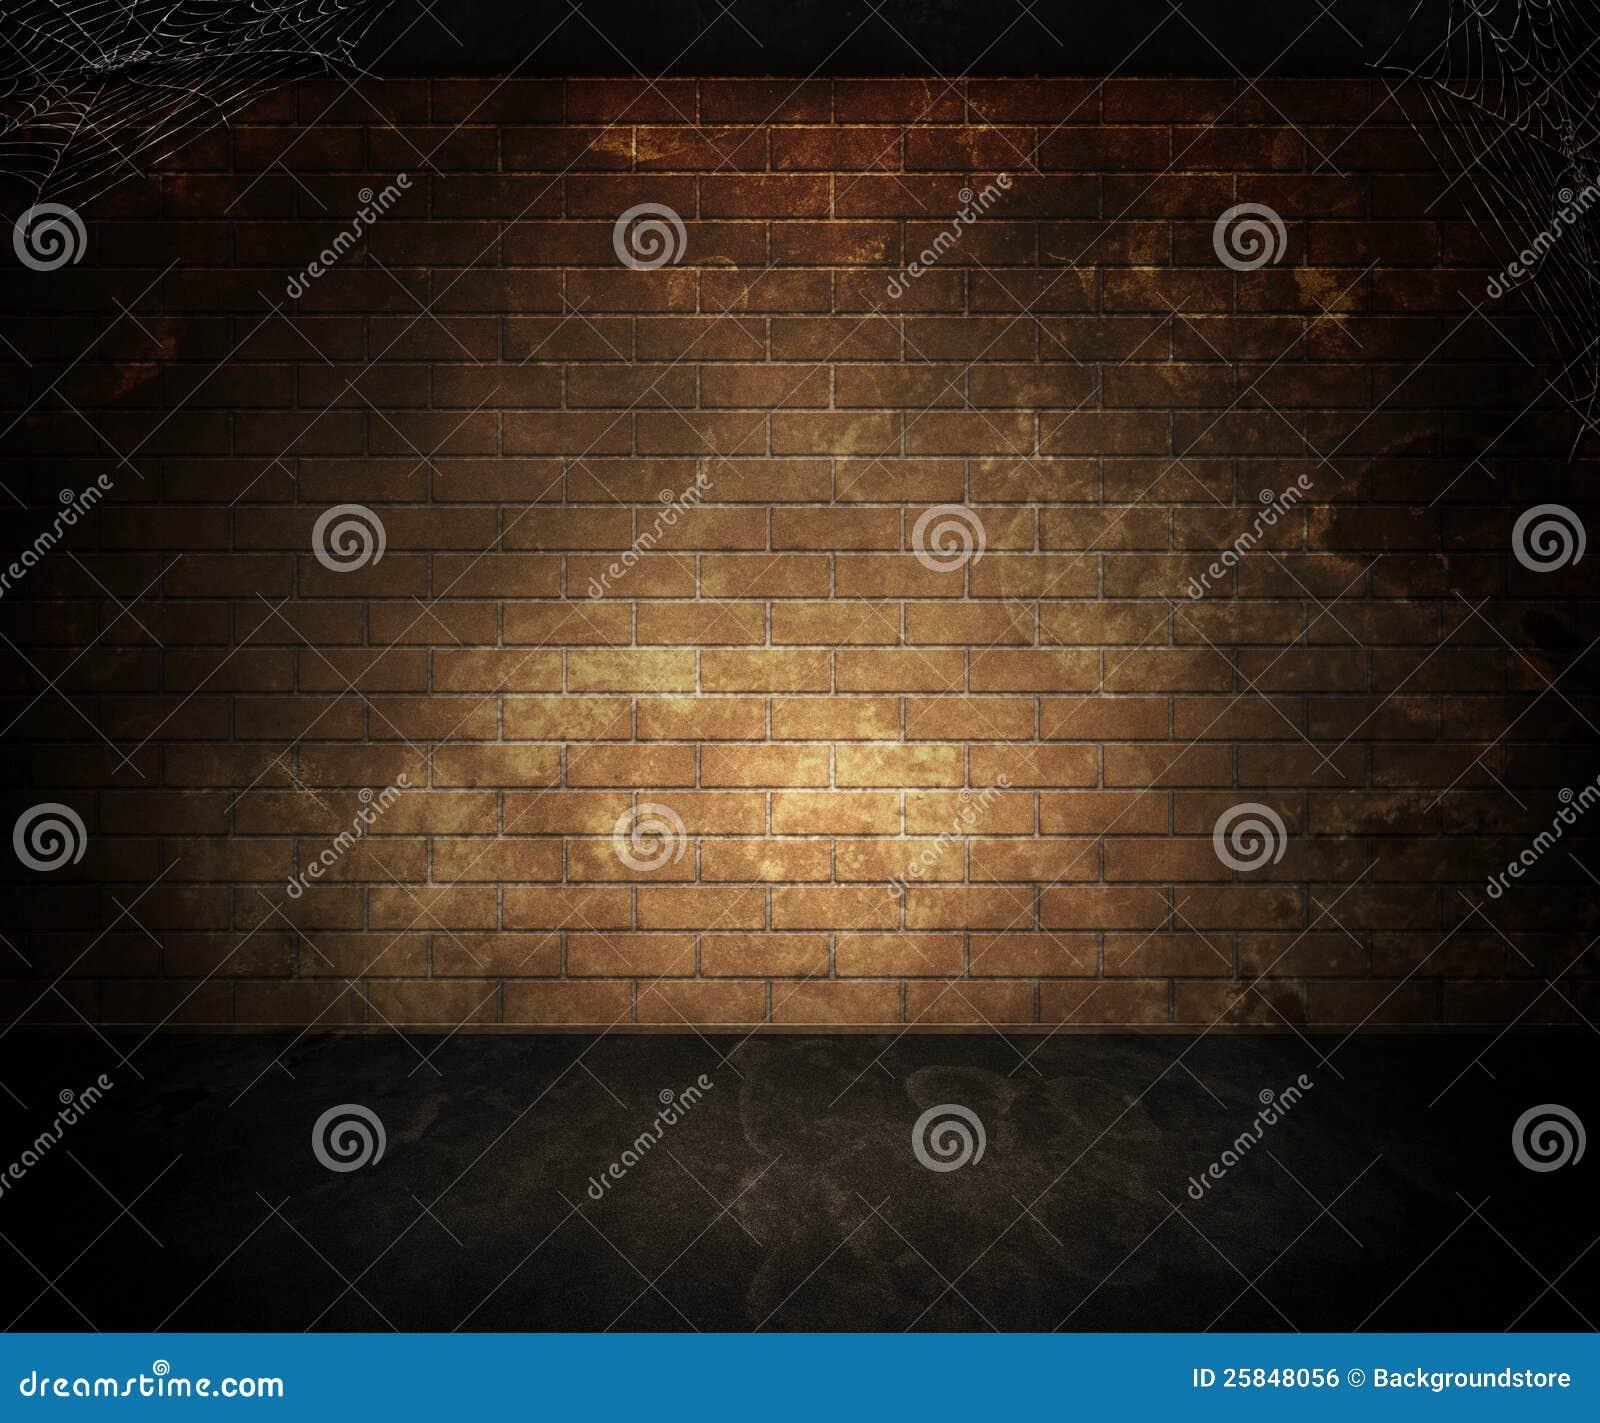 Dark Basement Background Royalty Free Stock Image